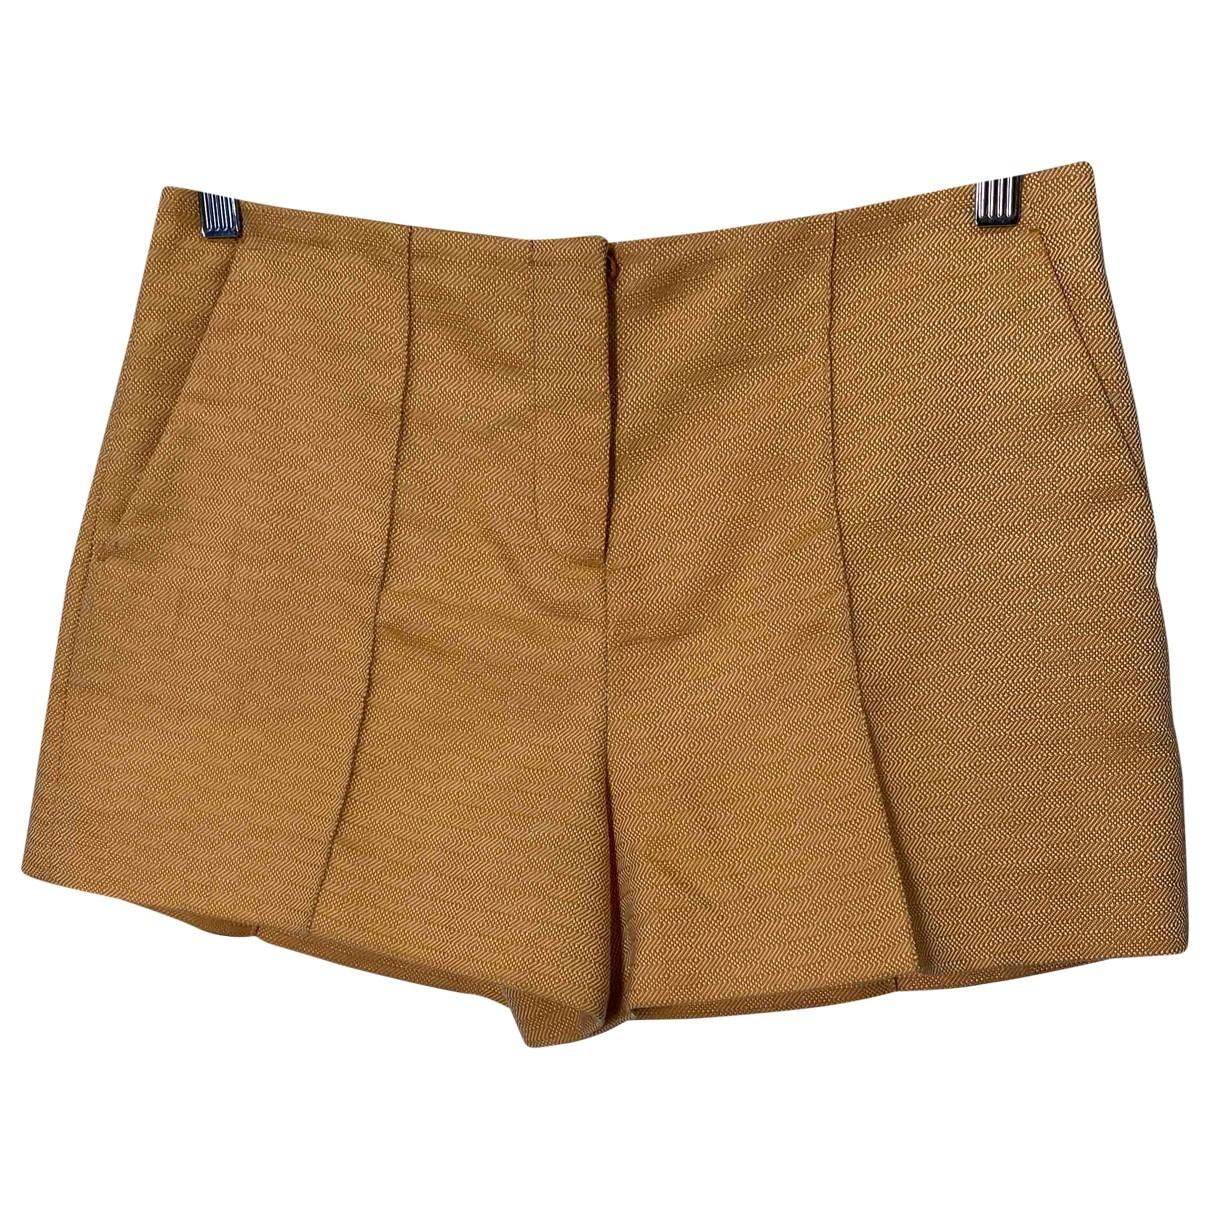 Miu Miu \N Shorts in  Kamel Polyester